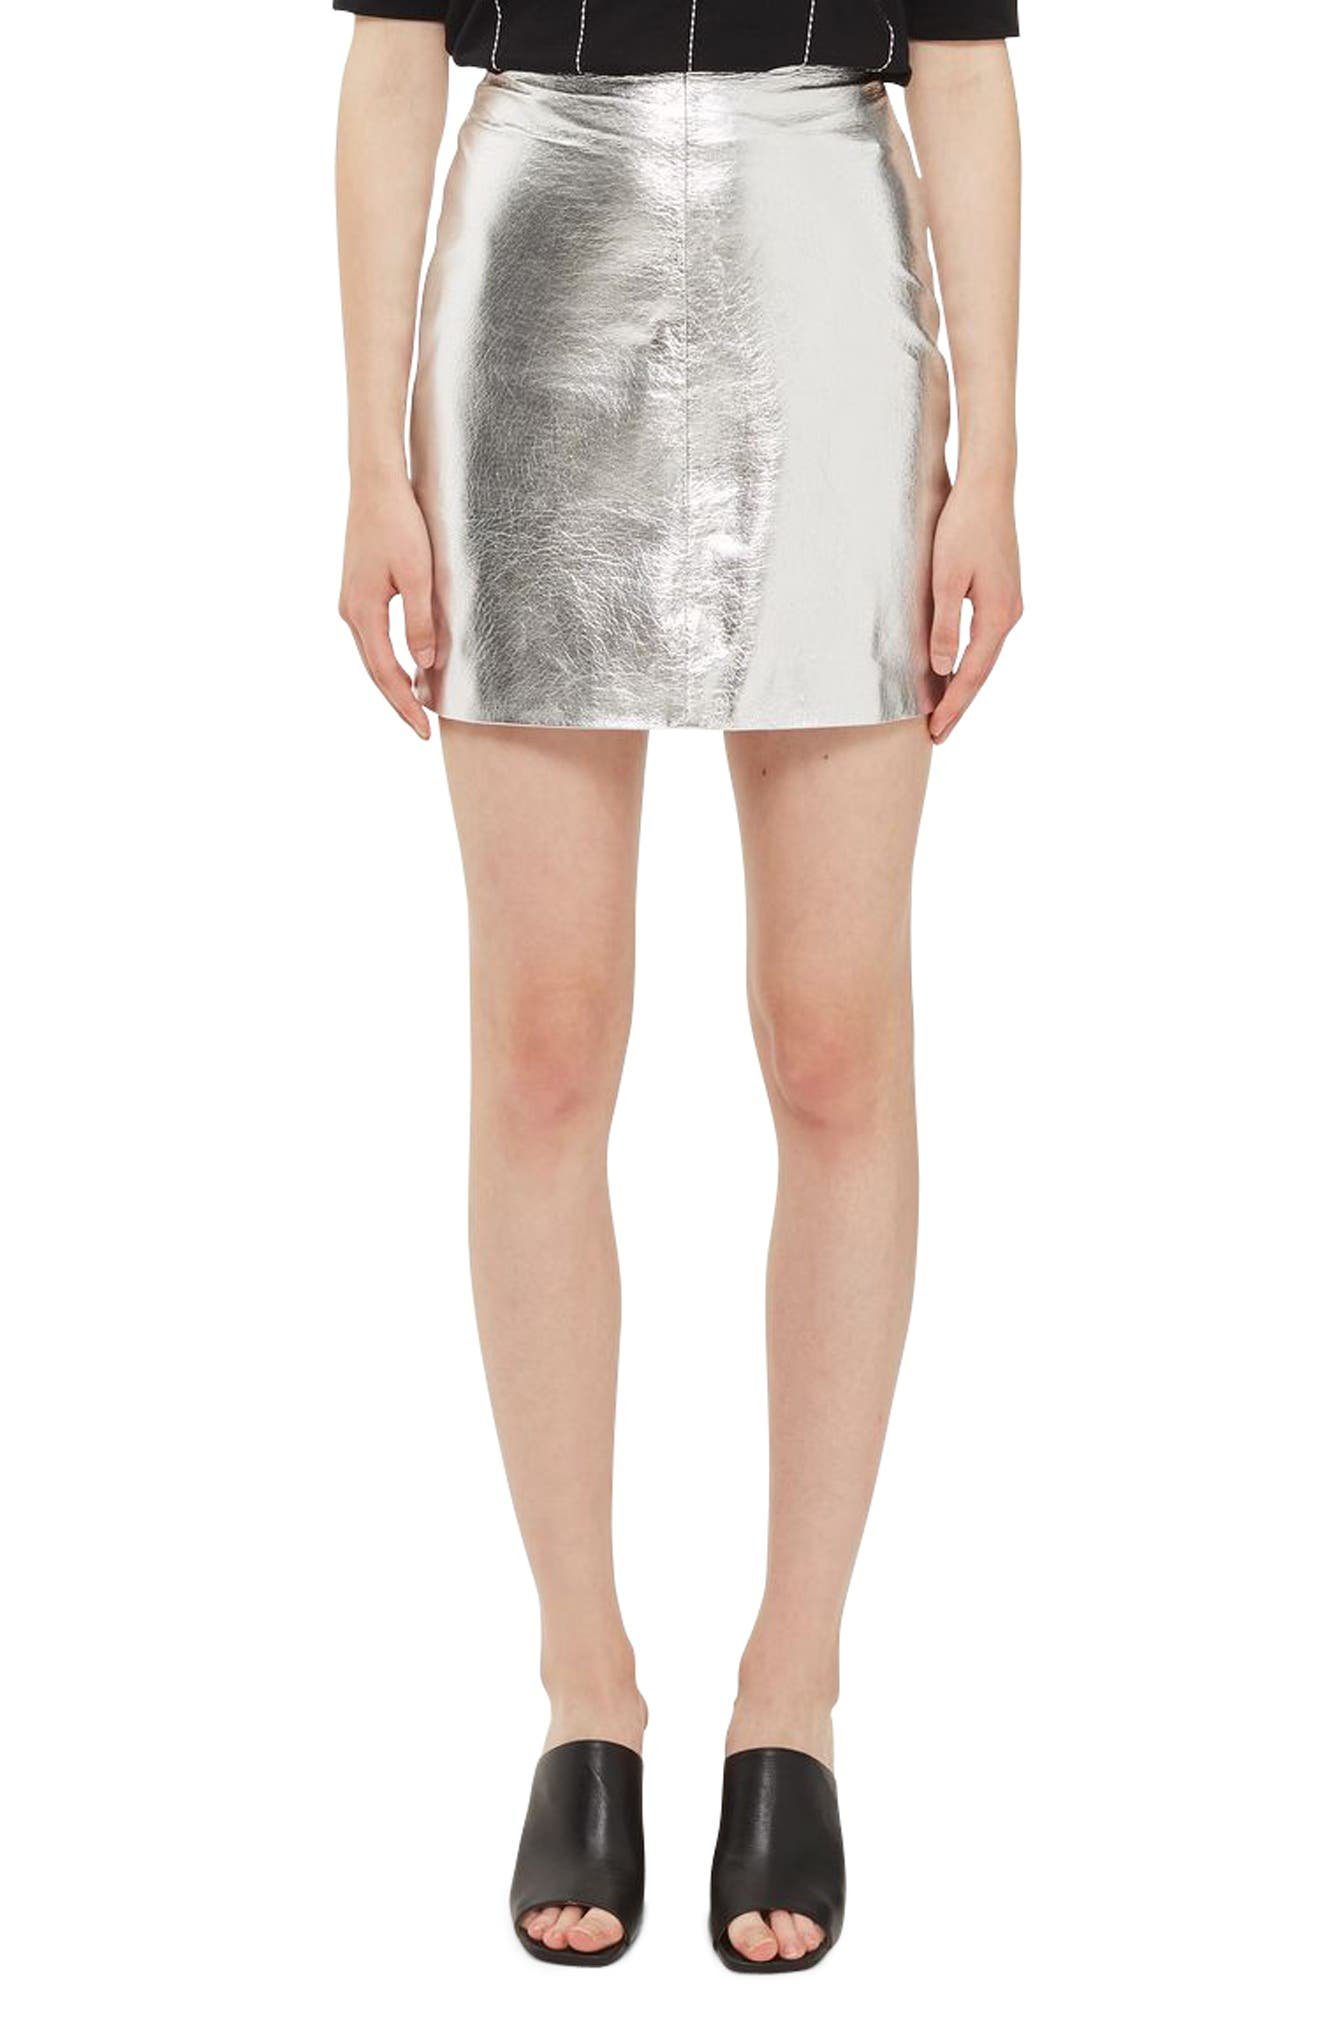 Topshop Boutique Metallic Leather Miniskirt